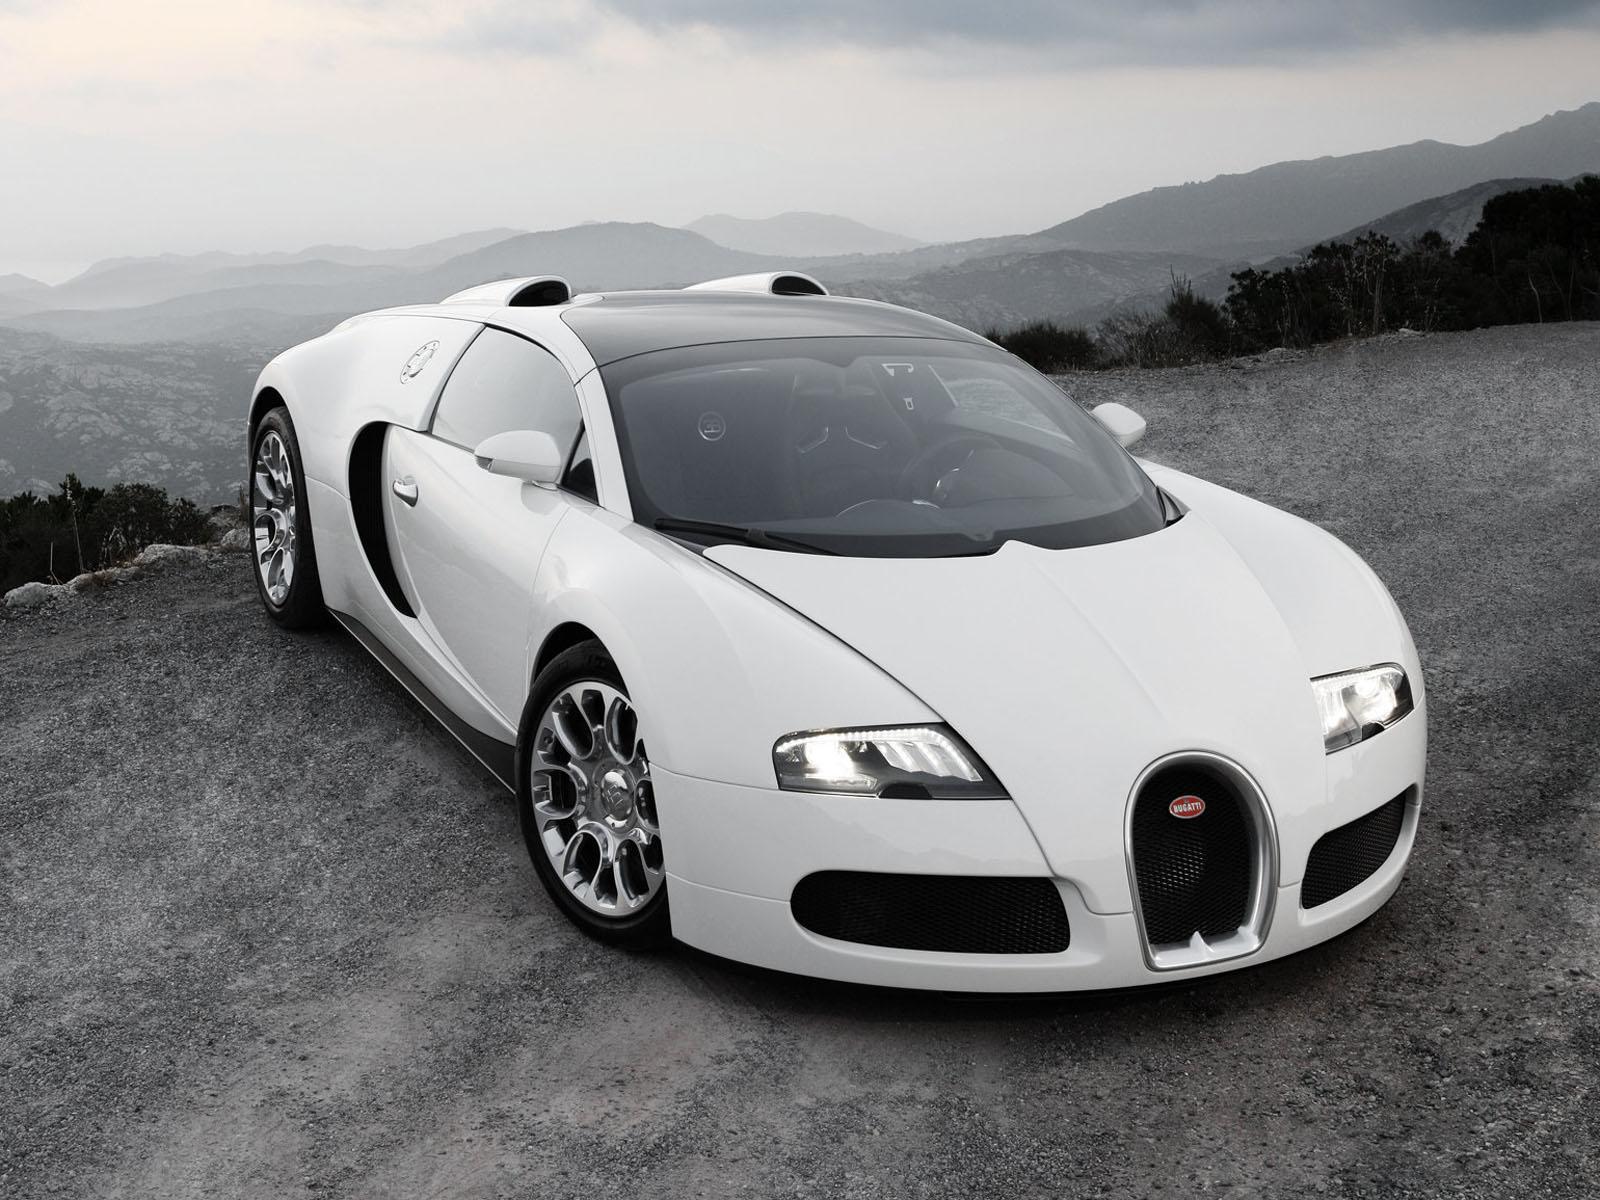 Sports Cars Wallpaper Hd Iphone: Bugatti Veyron Wallpaper